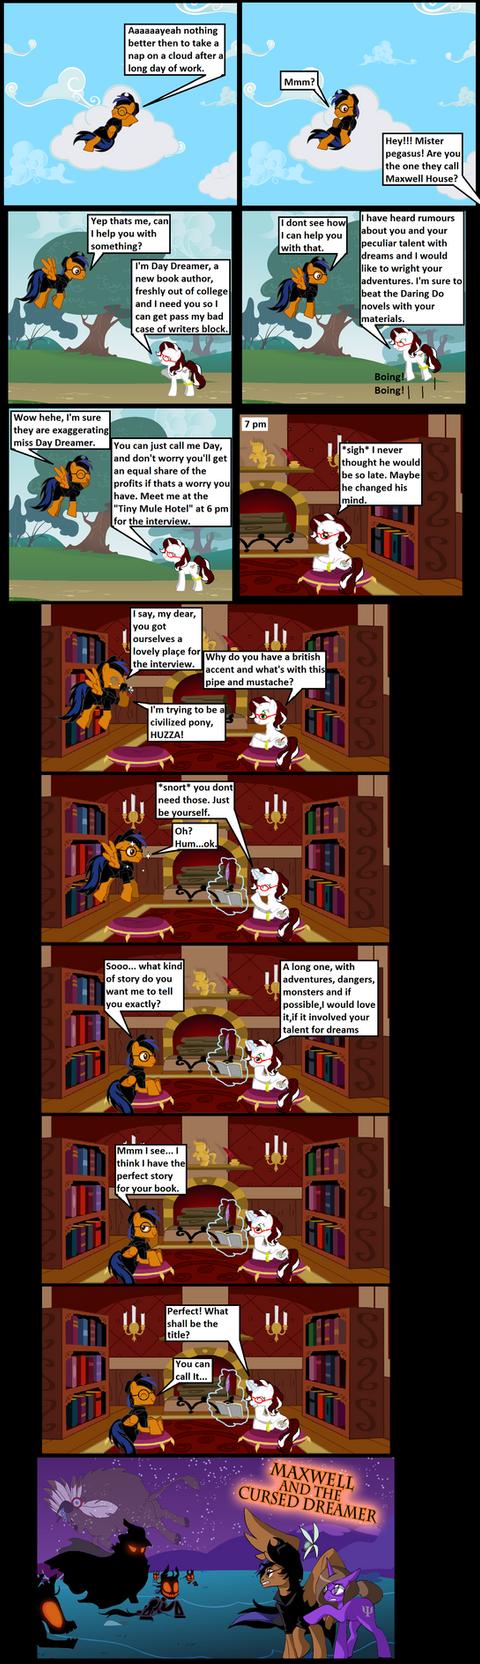 The cursed dreamer page 1 by darkoak213